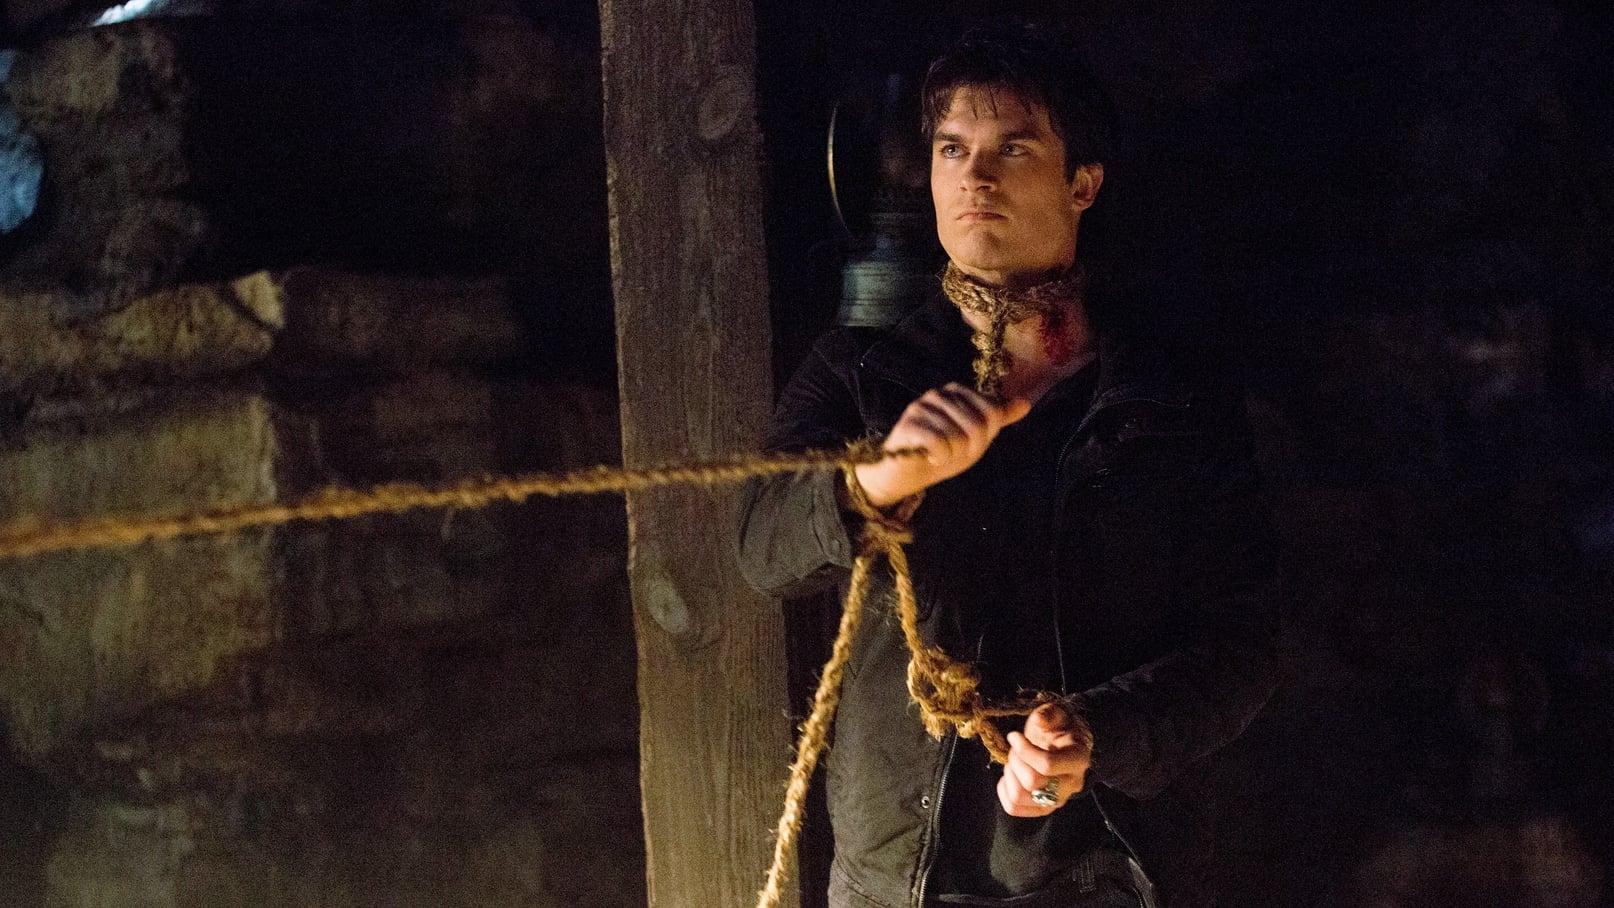 The Vampire Diaries - Season 4 Episode 14 : Down the Rabbit Hole